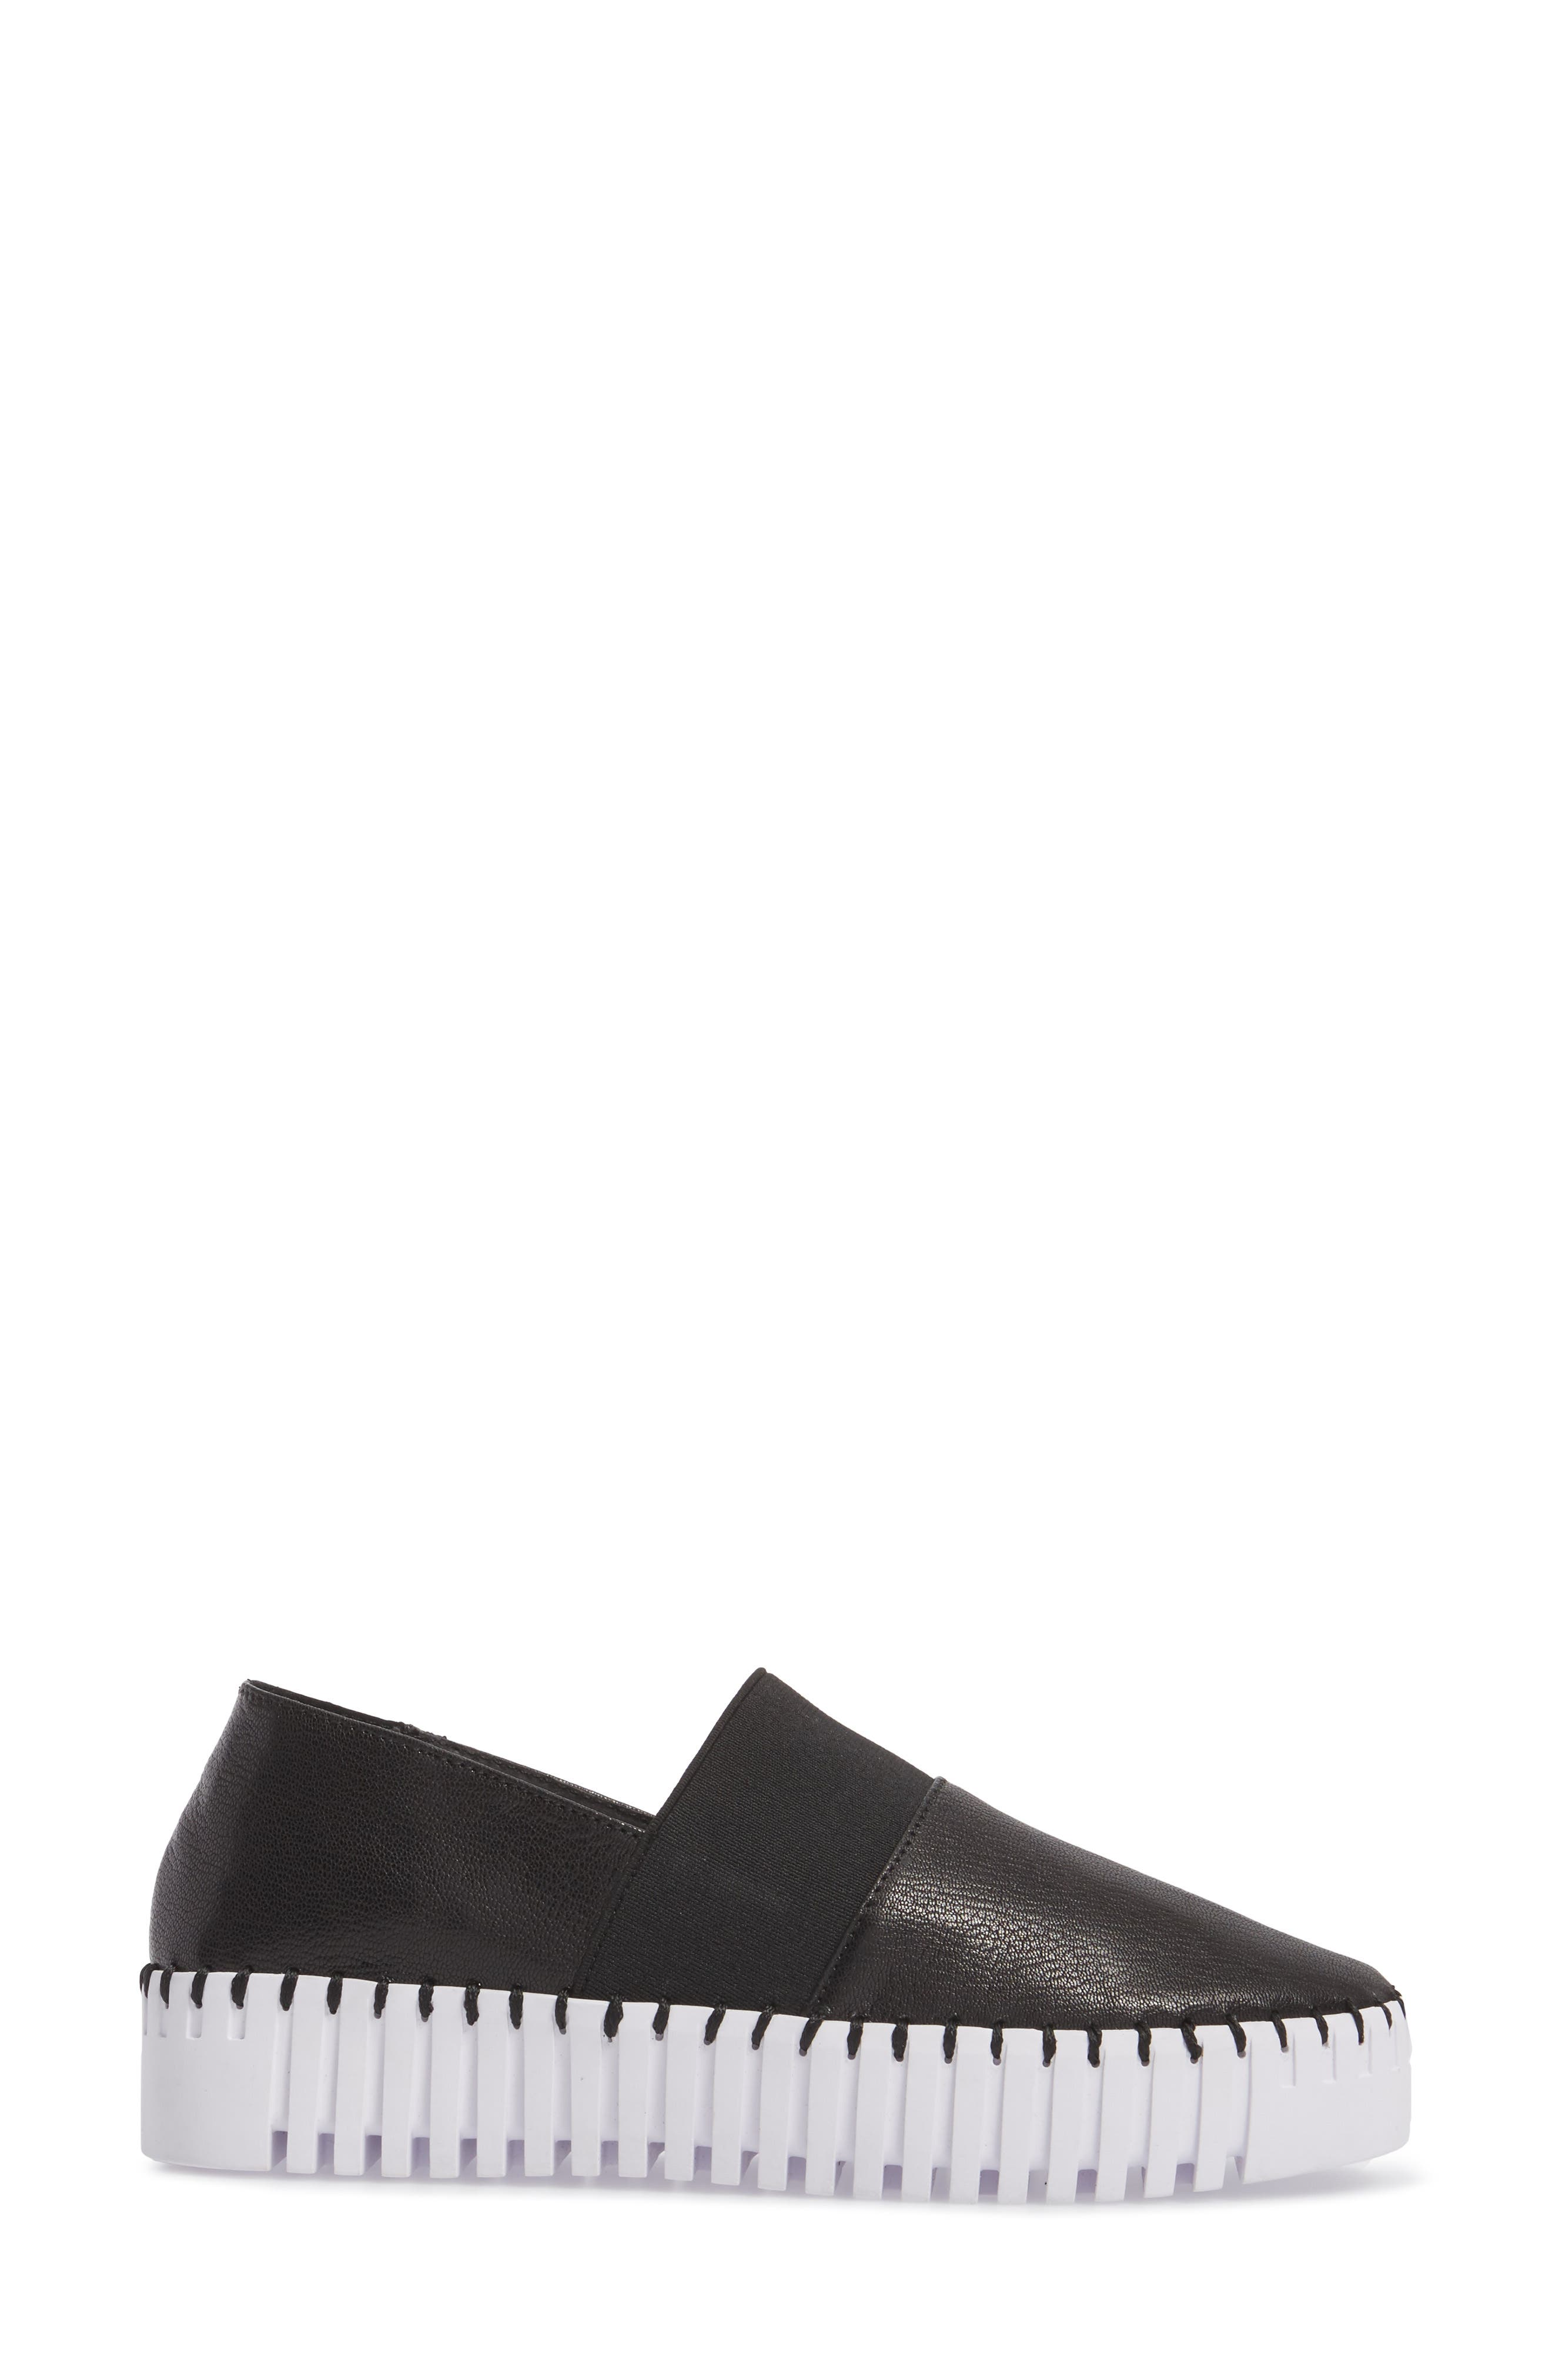 Cube Slip-On Platform Sneaker,                             Alternate thumbnail 3, color,                             Black Leather